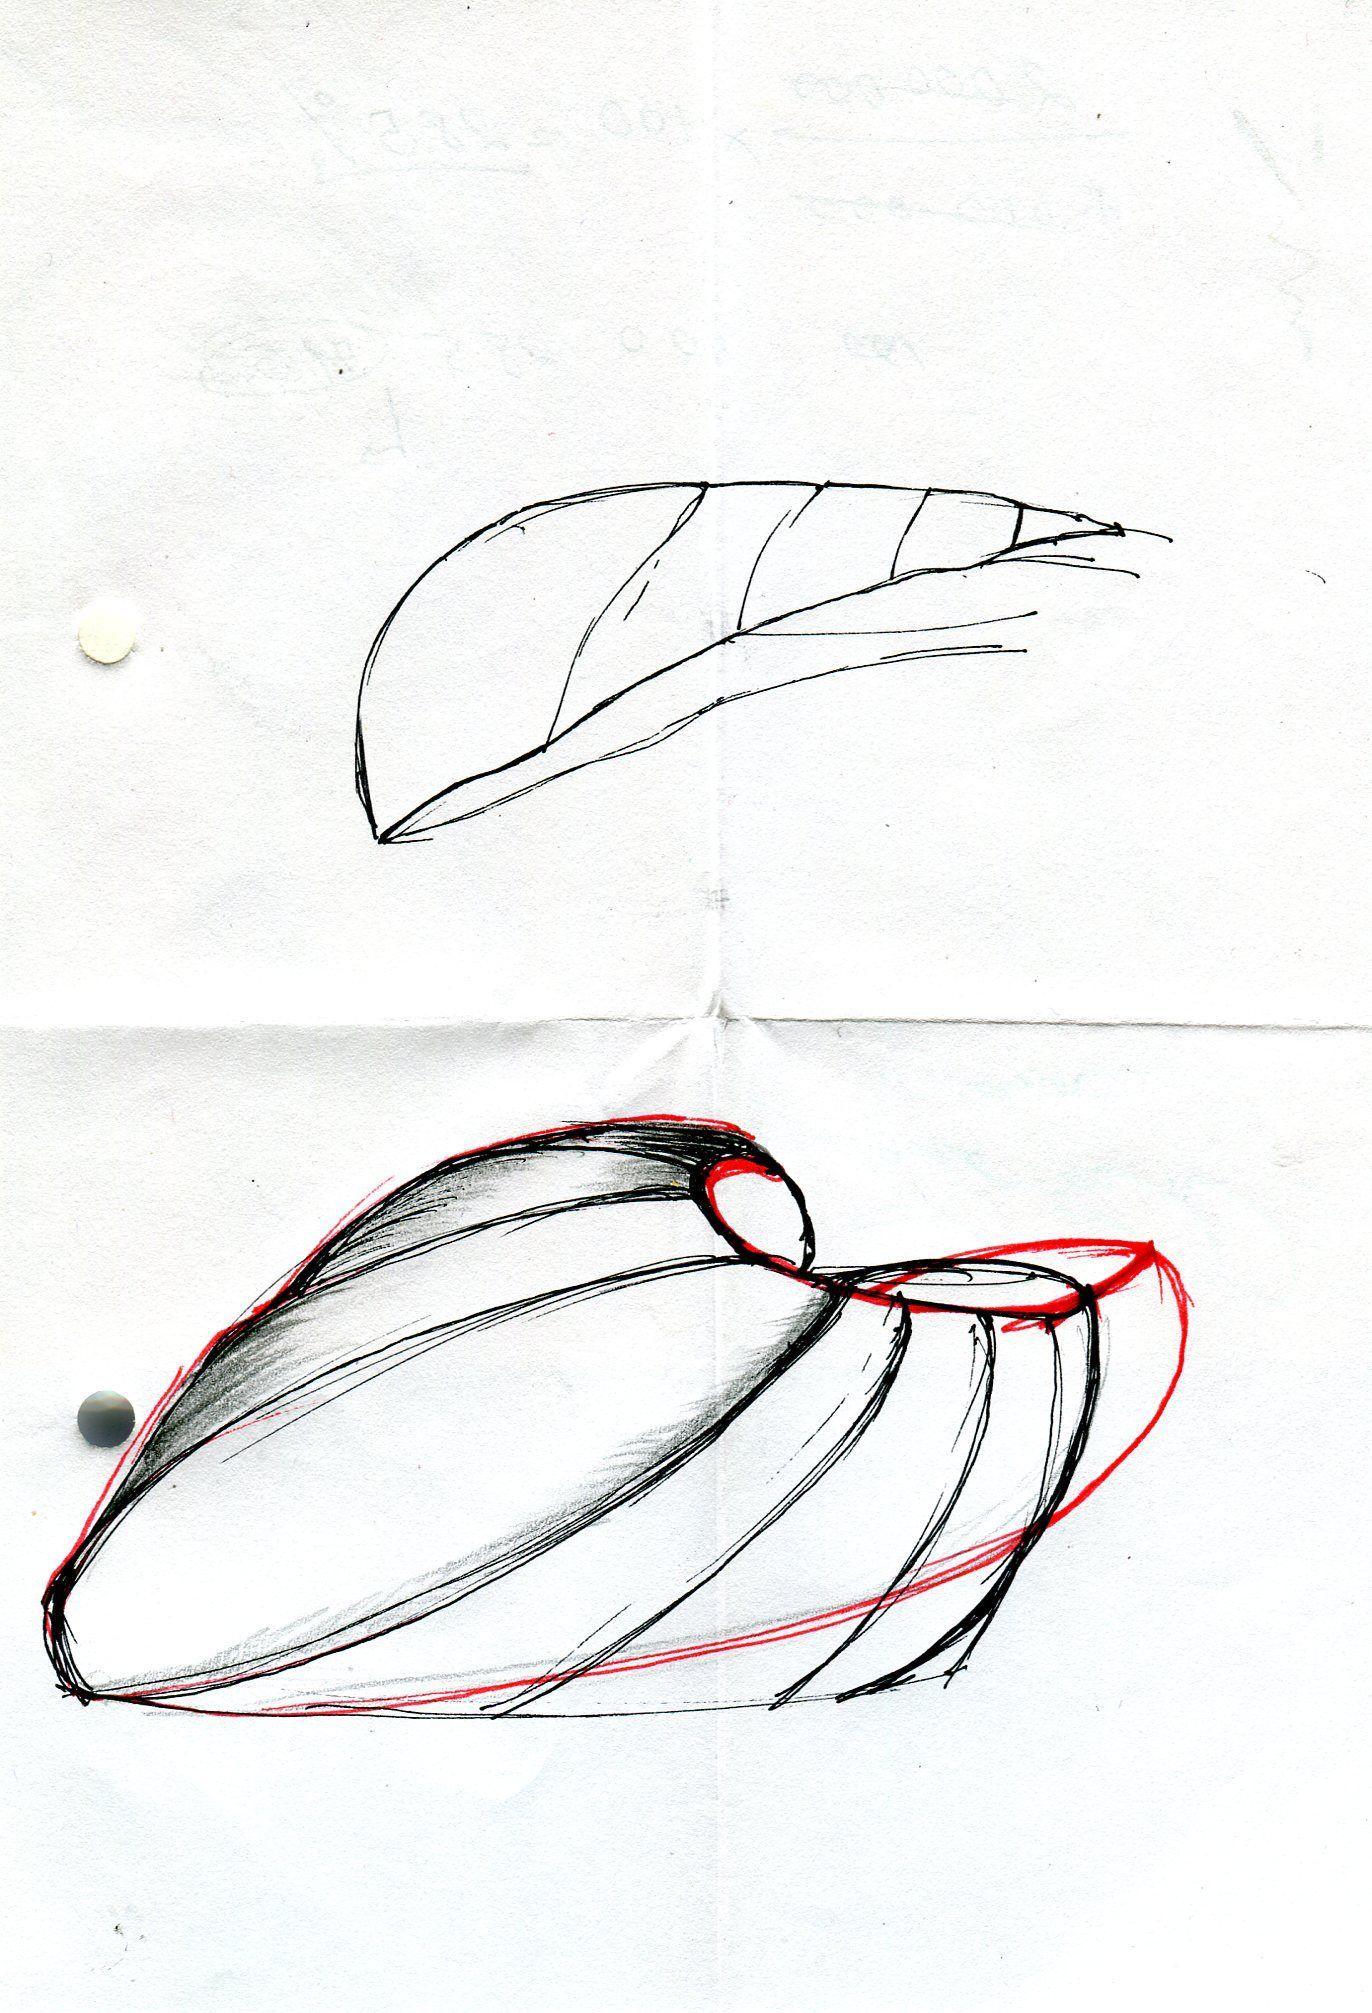 Zaha Hadid Design Concepts And Theory personal sketch on zaha hadid's design morphology #design #sketch